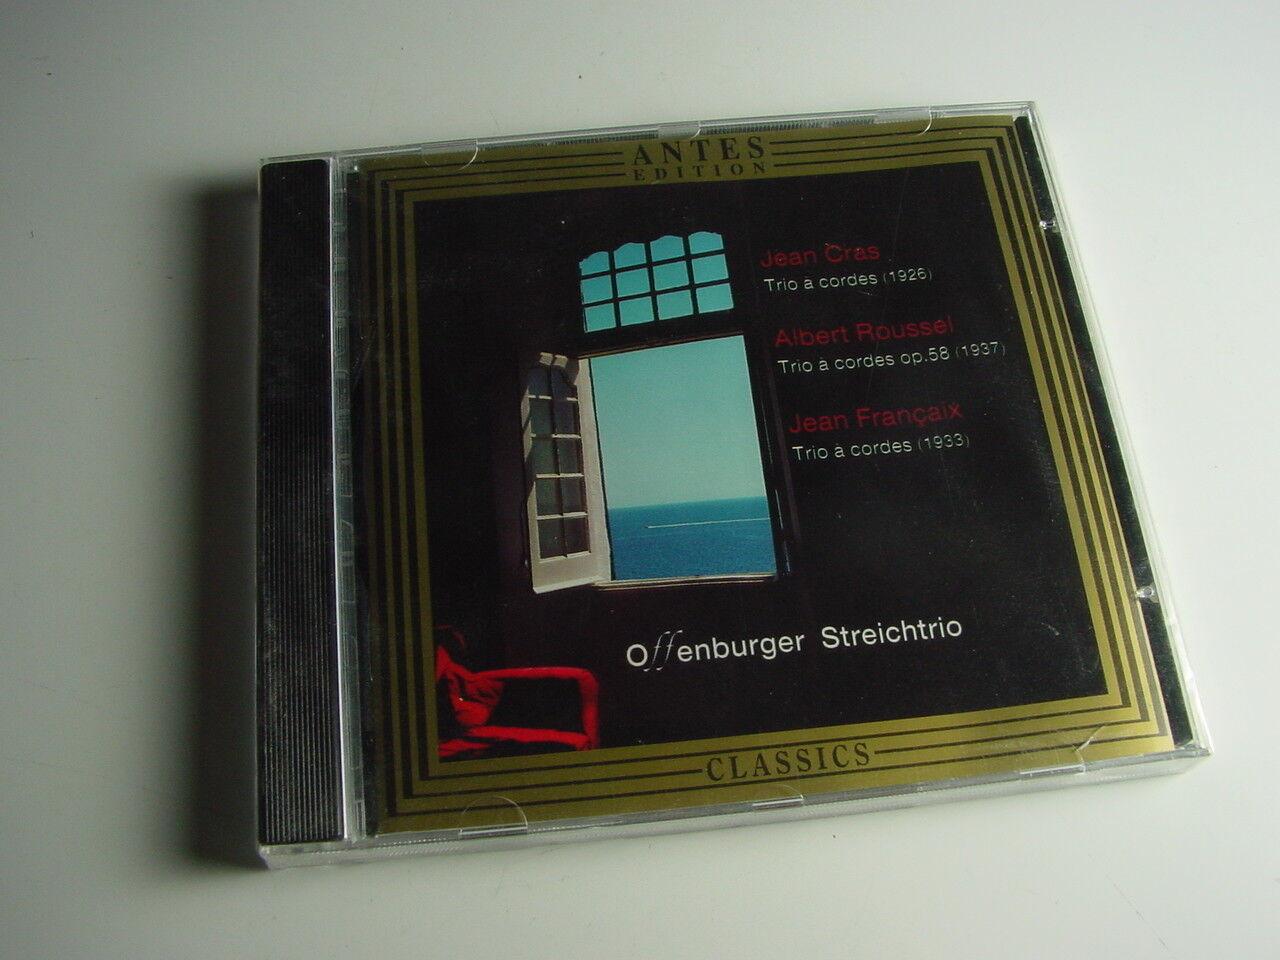 Offenburger Streichtrio, Neue Cd Original Verpackt. Grass, Roussel, Francaix.